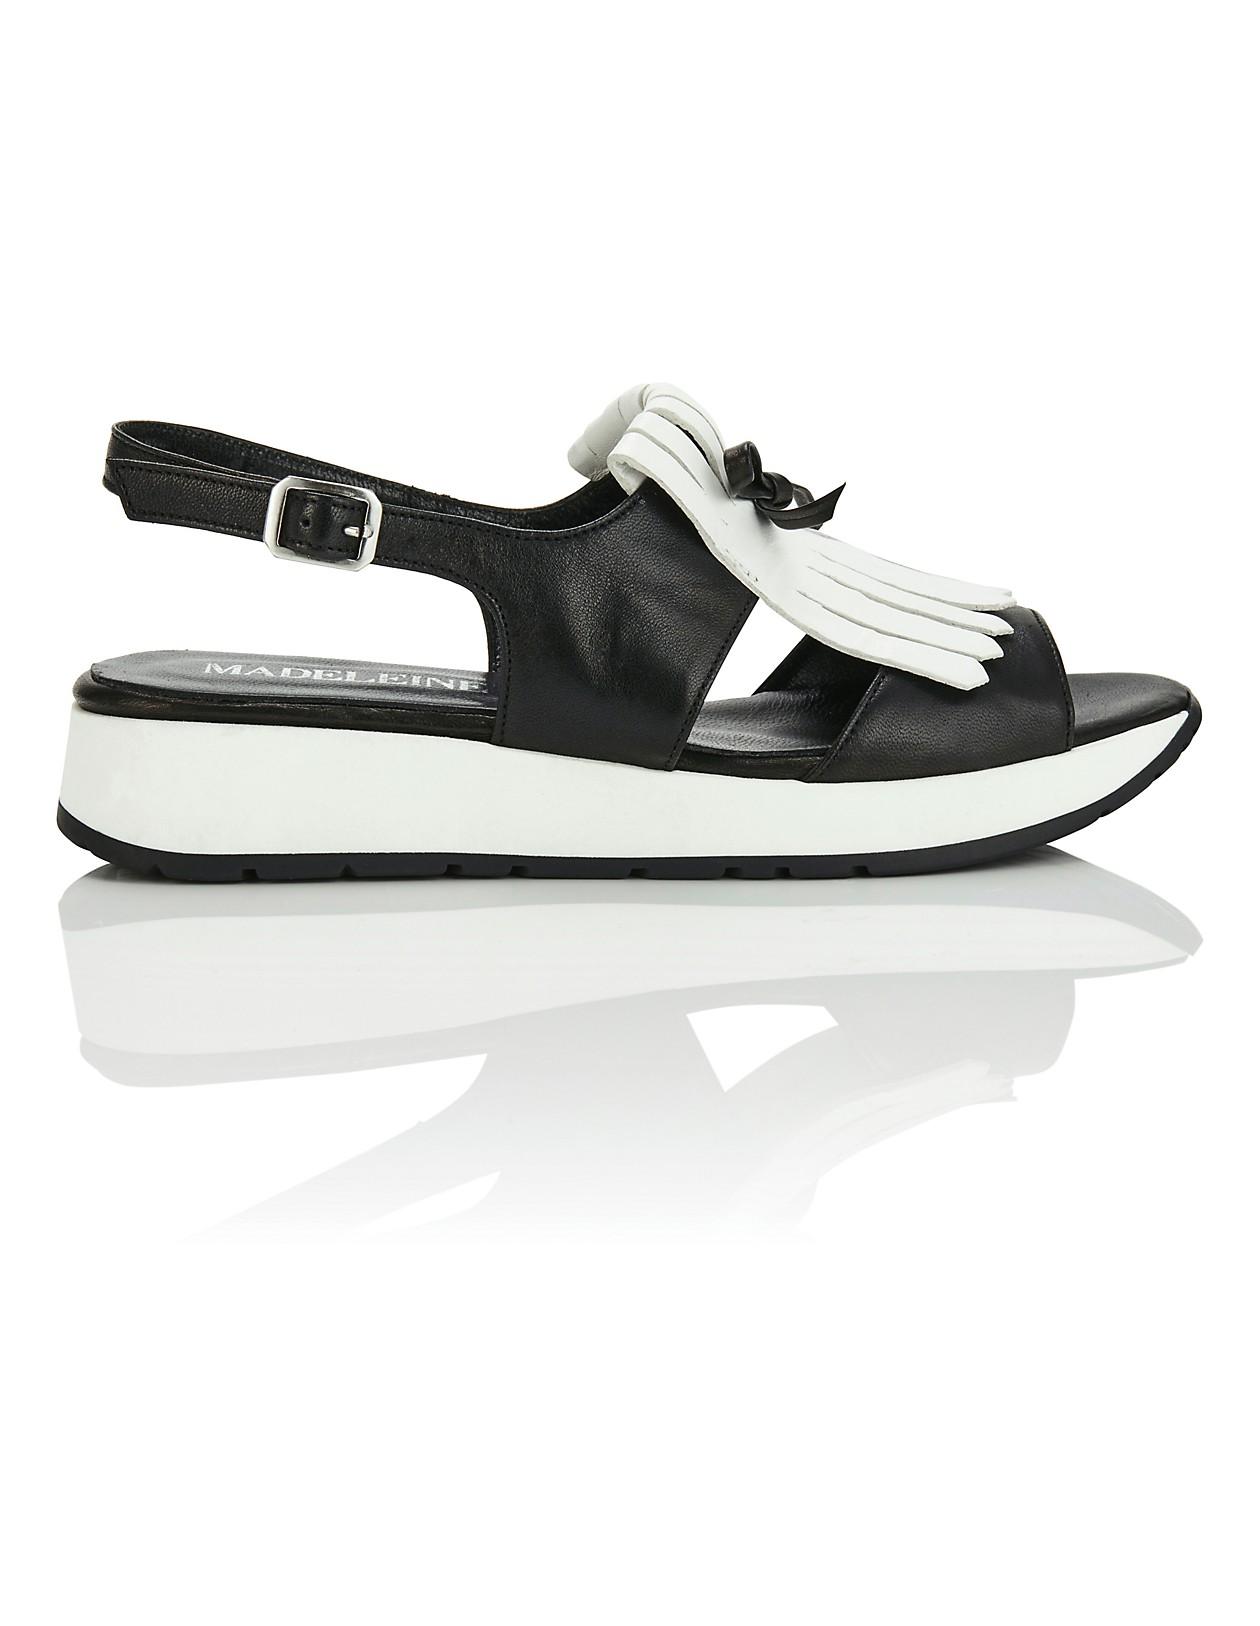 SandalsBlackwhiteBlackWhiteMadeleine Fashion Handmade Fashion Italian Handmade Italian SandalsBlackwhiteBlackWhiteMadeleine Handmade nOwN0m8yvP